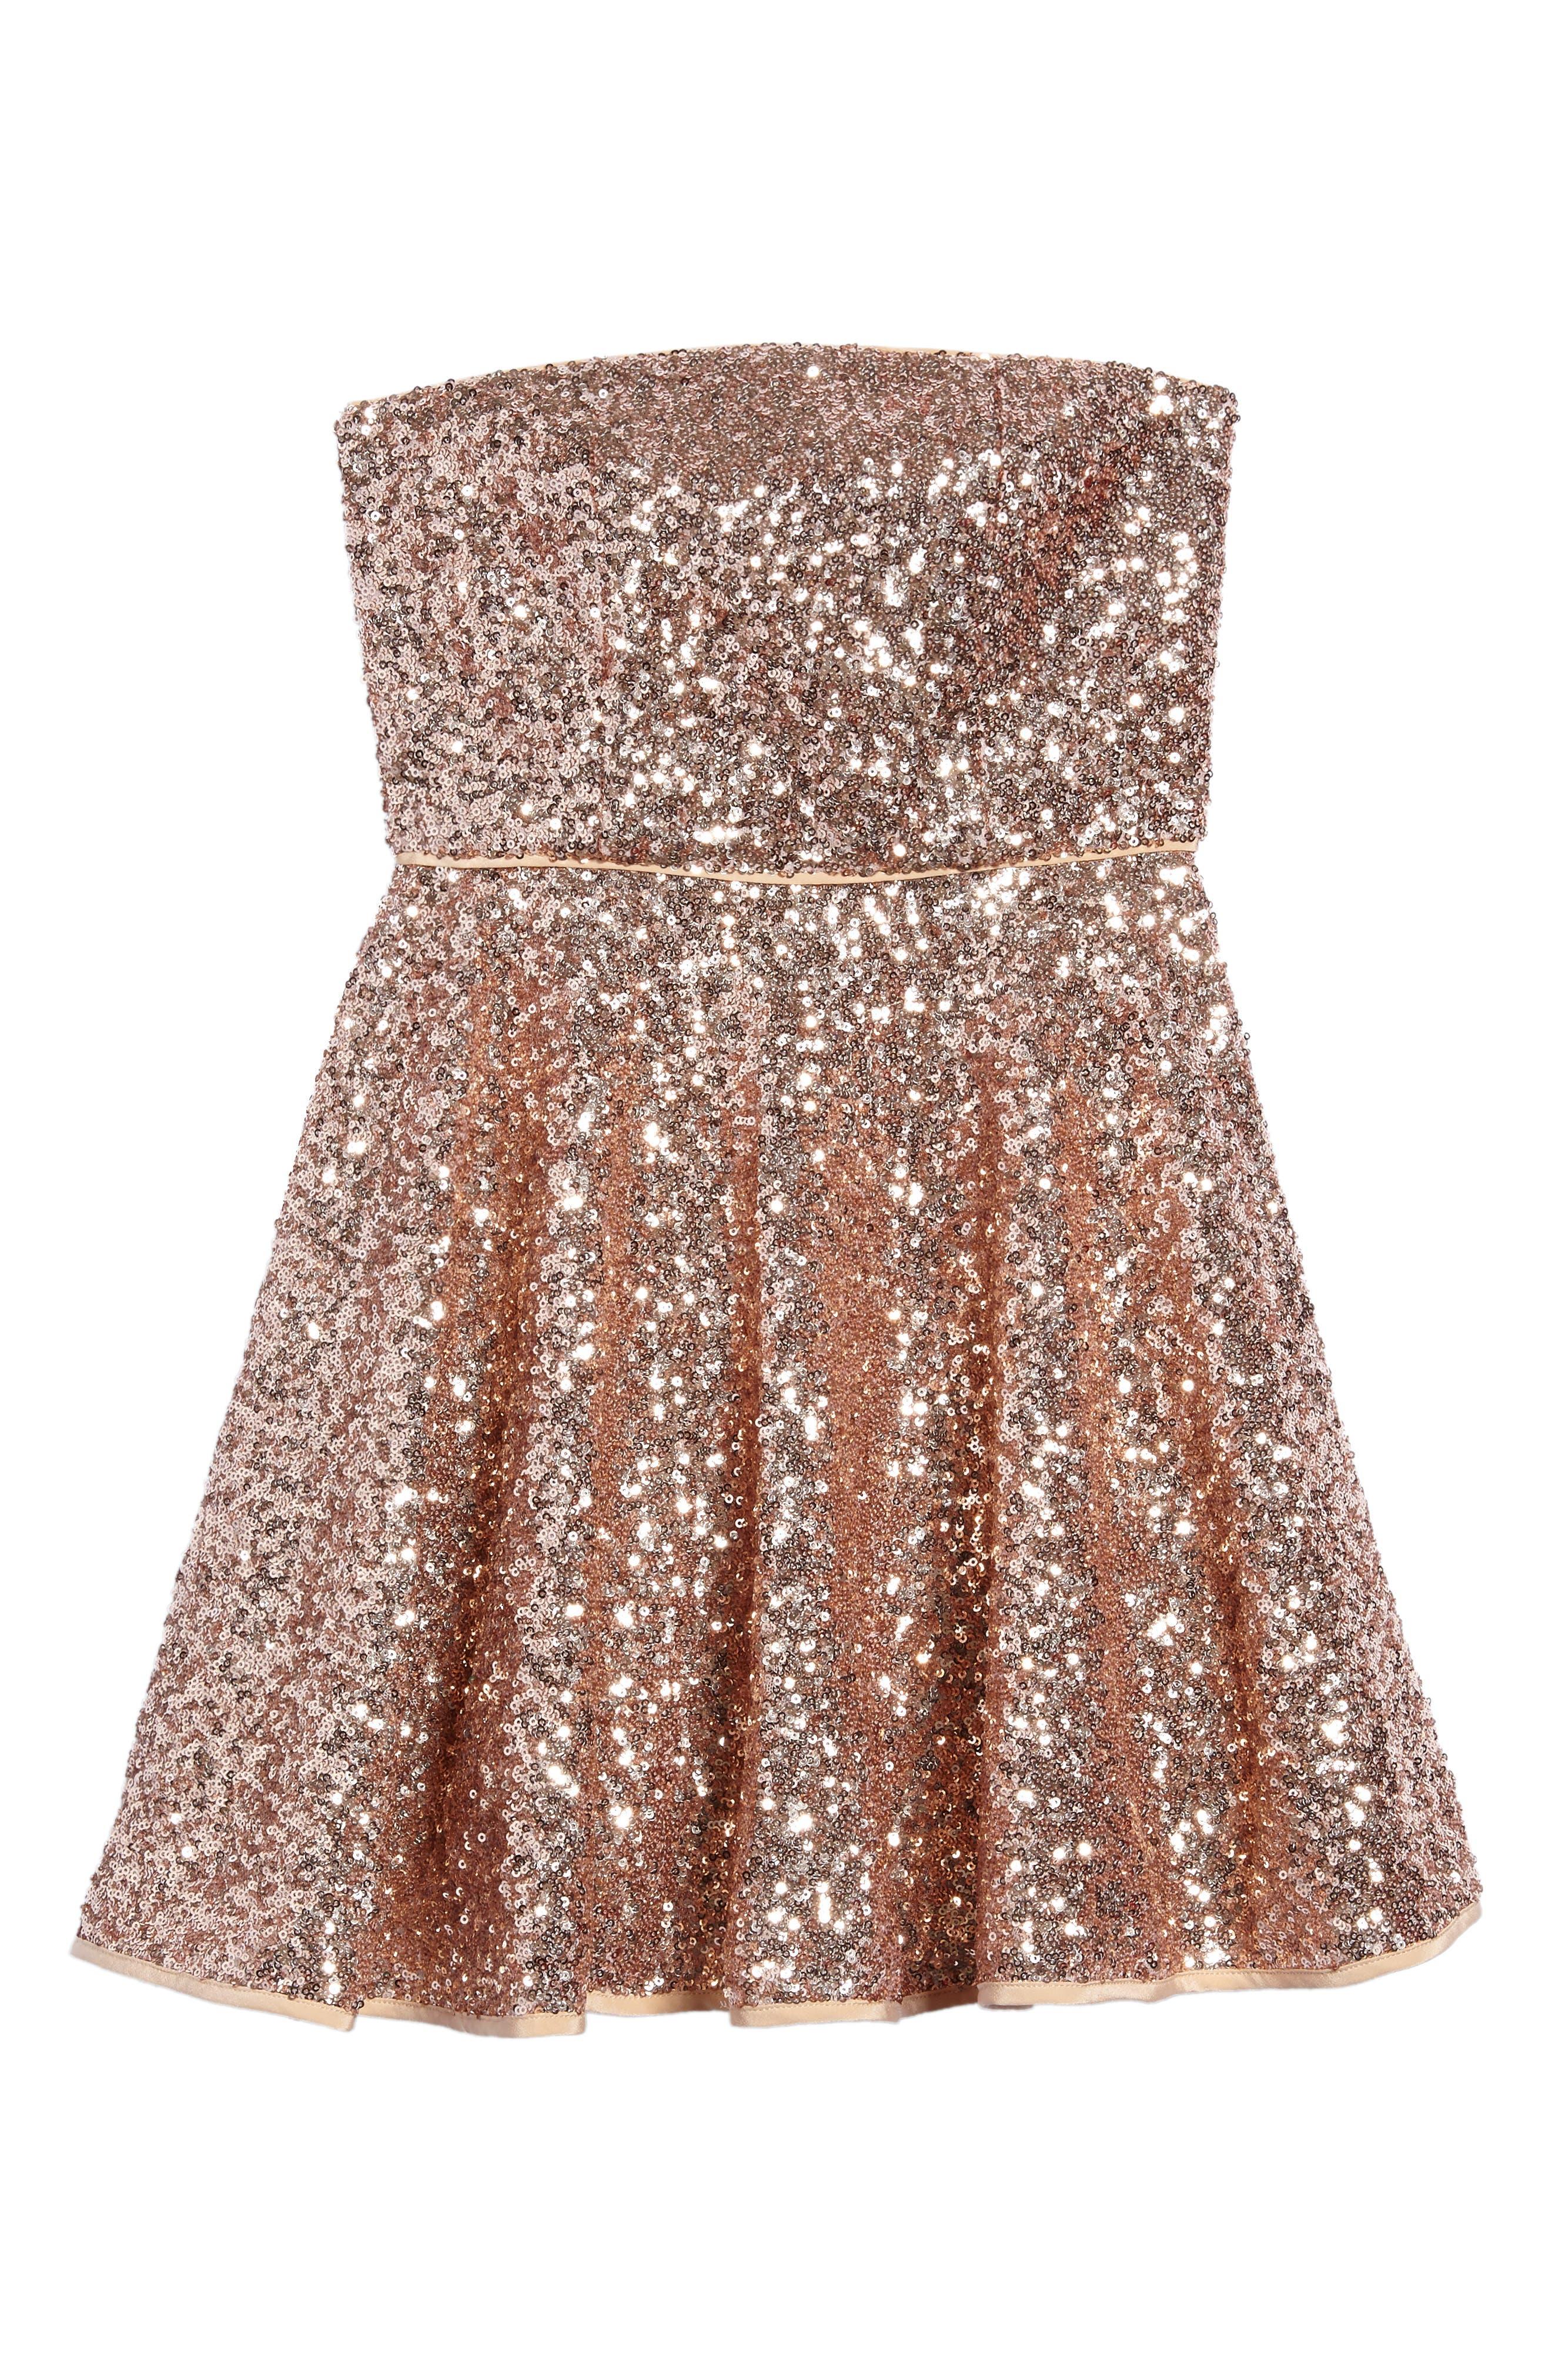 Milly Minis Ellie Sequin Strapless Dress (Big Girls)